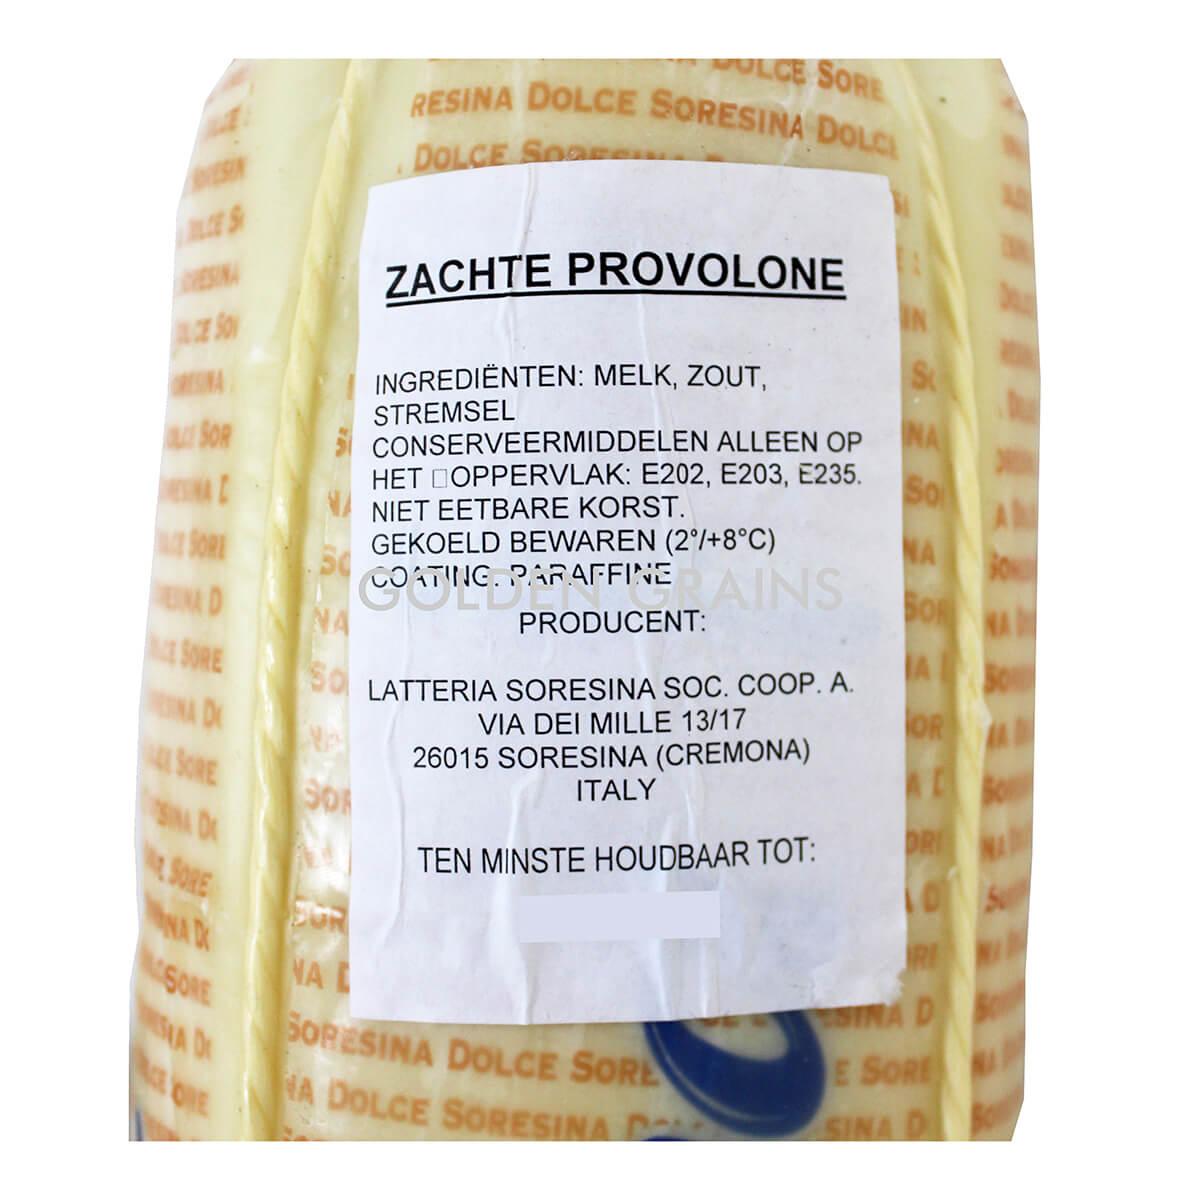 Golden Grains Dubai Export - Provolone - Label.jpg